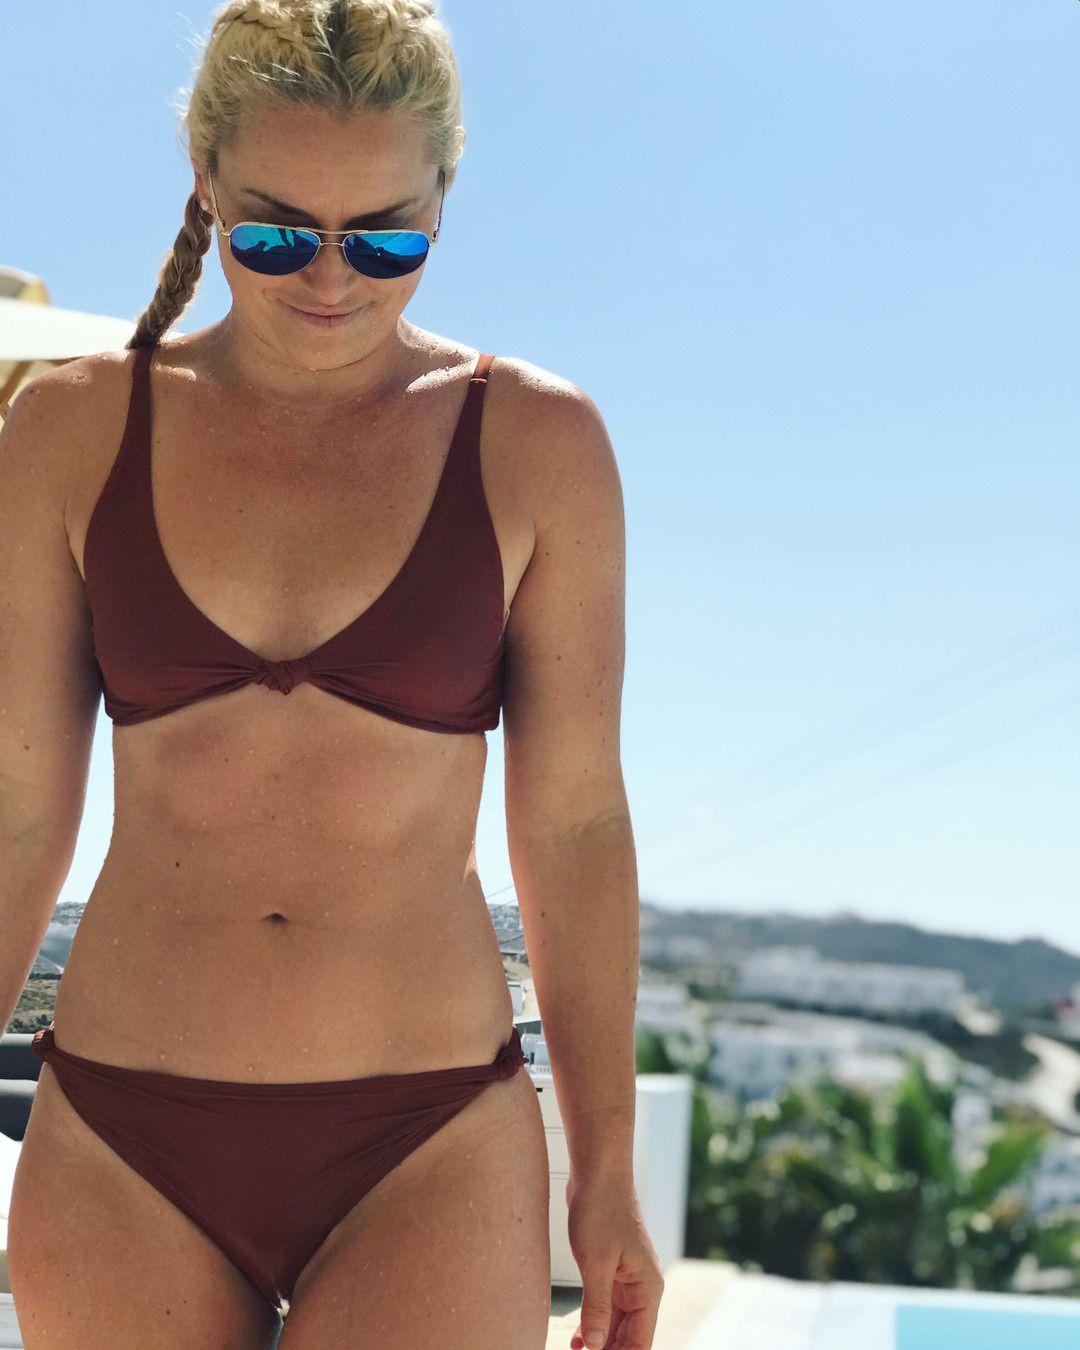 Hot Lindsey Vonn nudes (33 photo), Topless, Leaked, Selfie, in bikini 2019